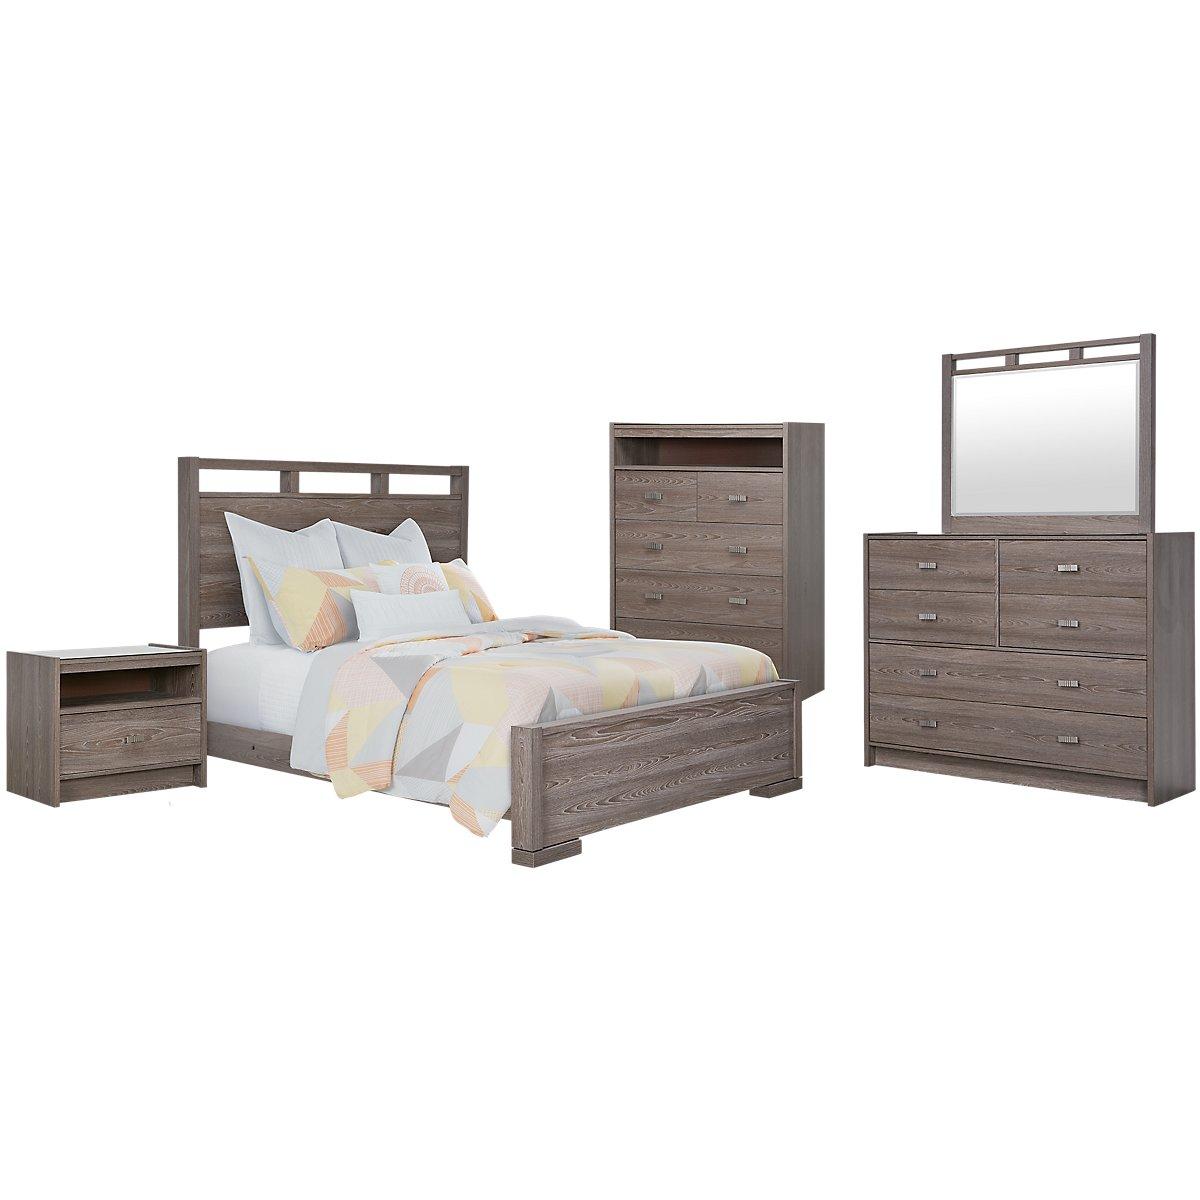 City Furniture: Sutton Dark Tone Panel Bedroom Package